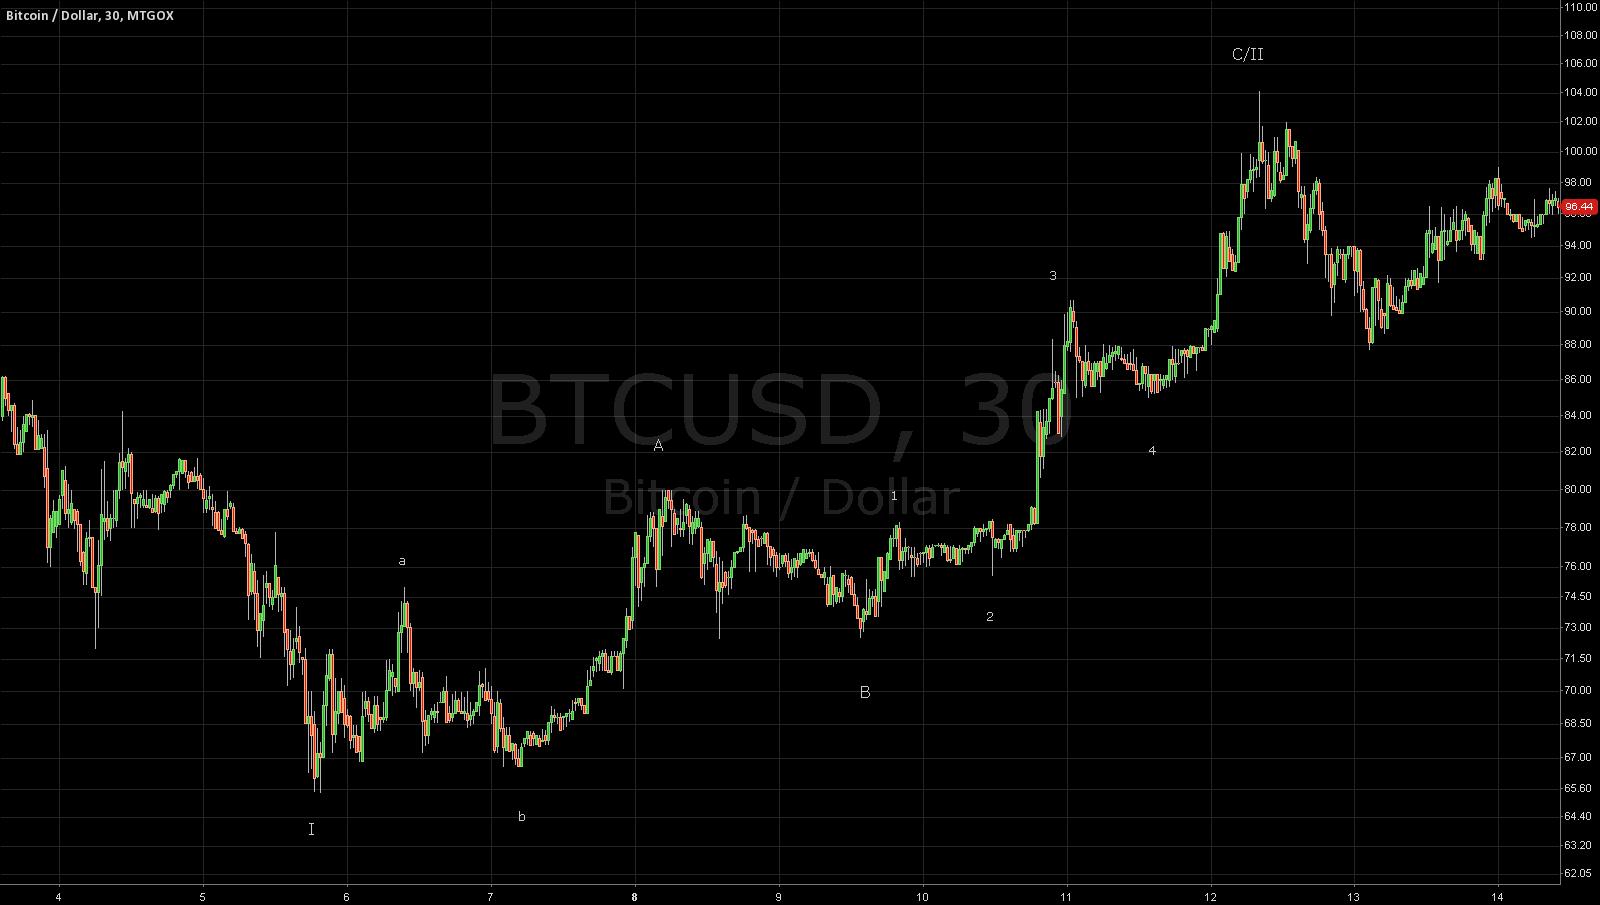 My take on the Bitcoin correction